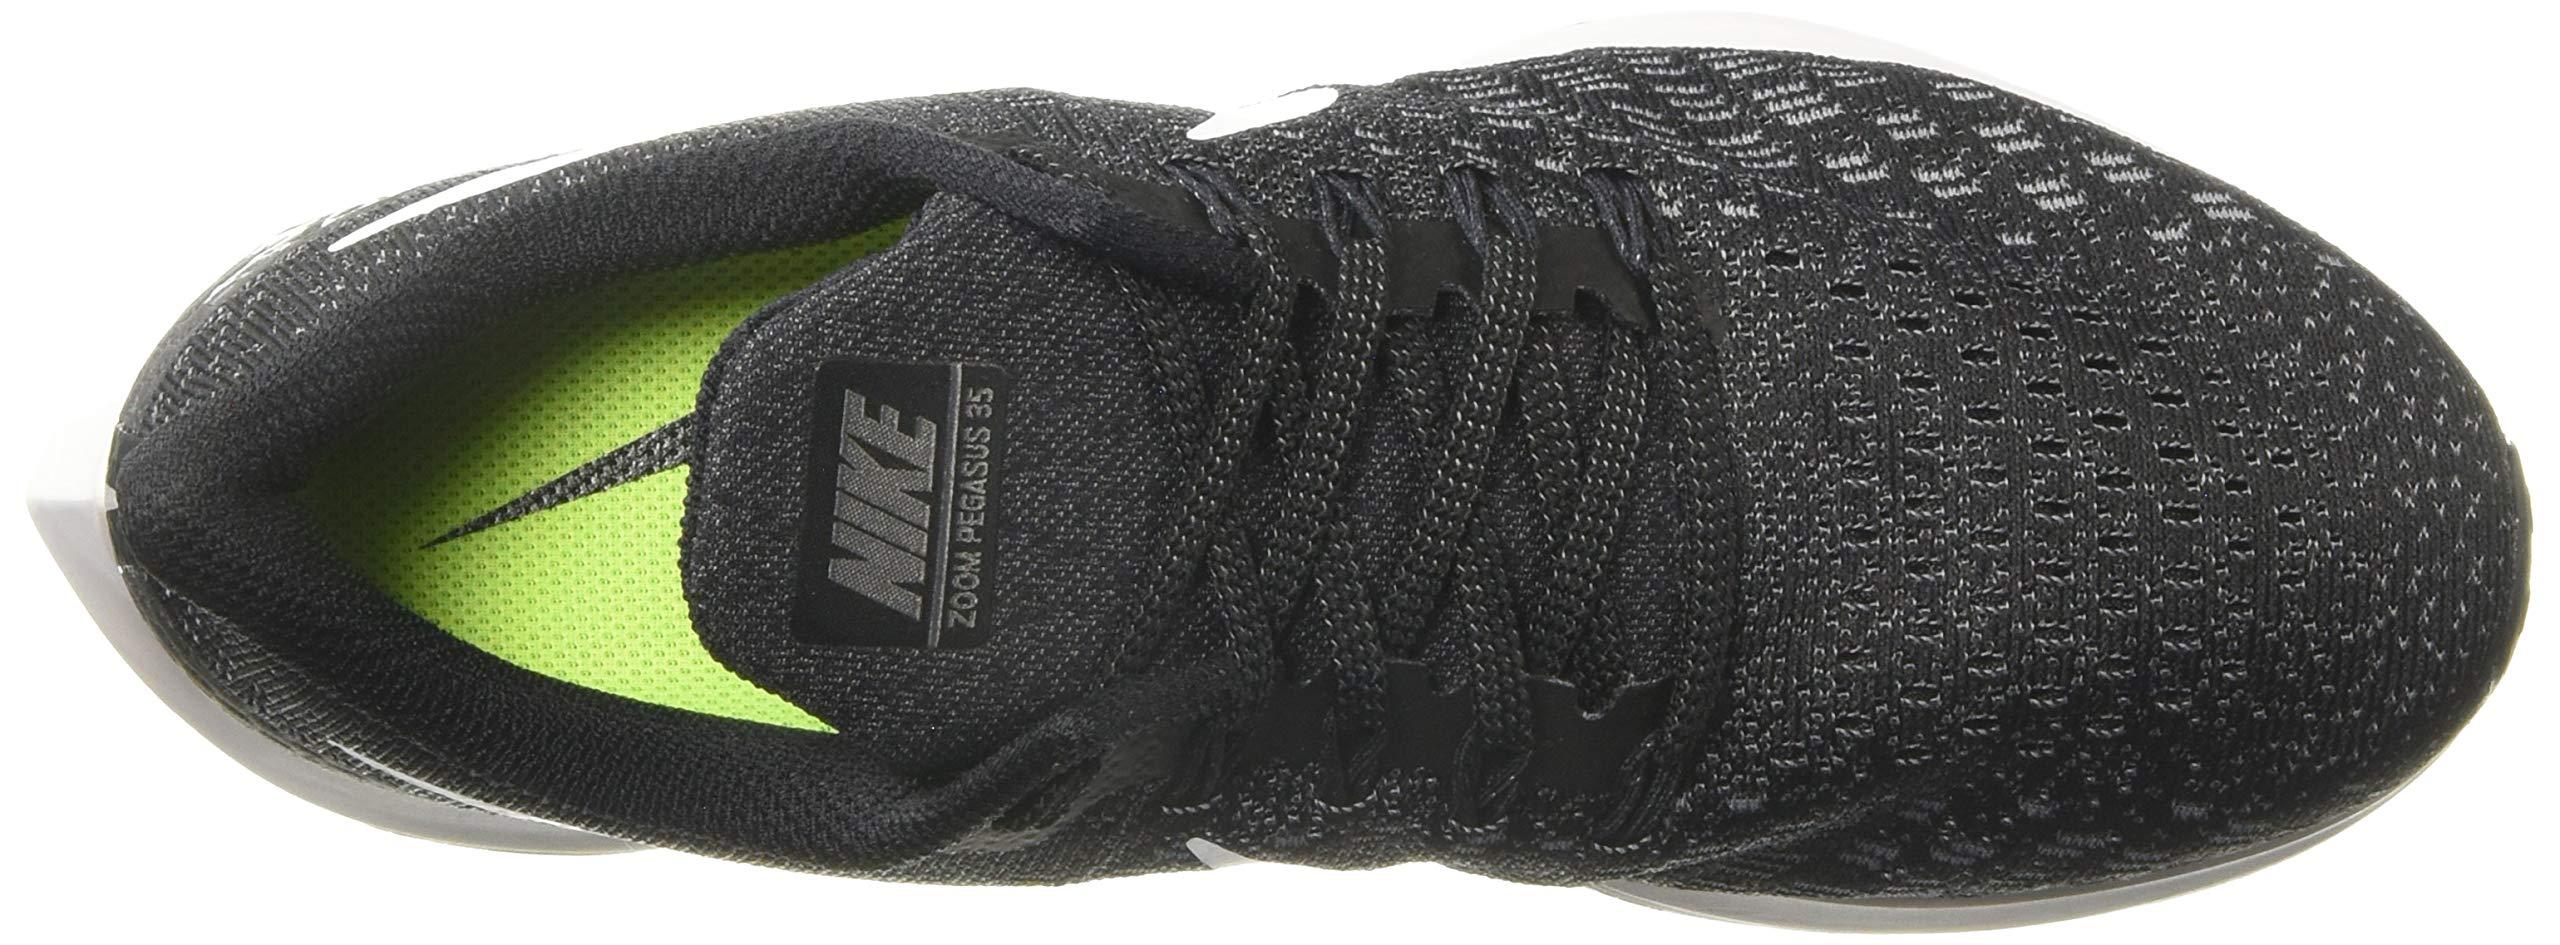 Nike Shox Current Gs Women's Running Shoe (5, Black/Black) by Nike (Image #7)